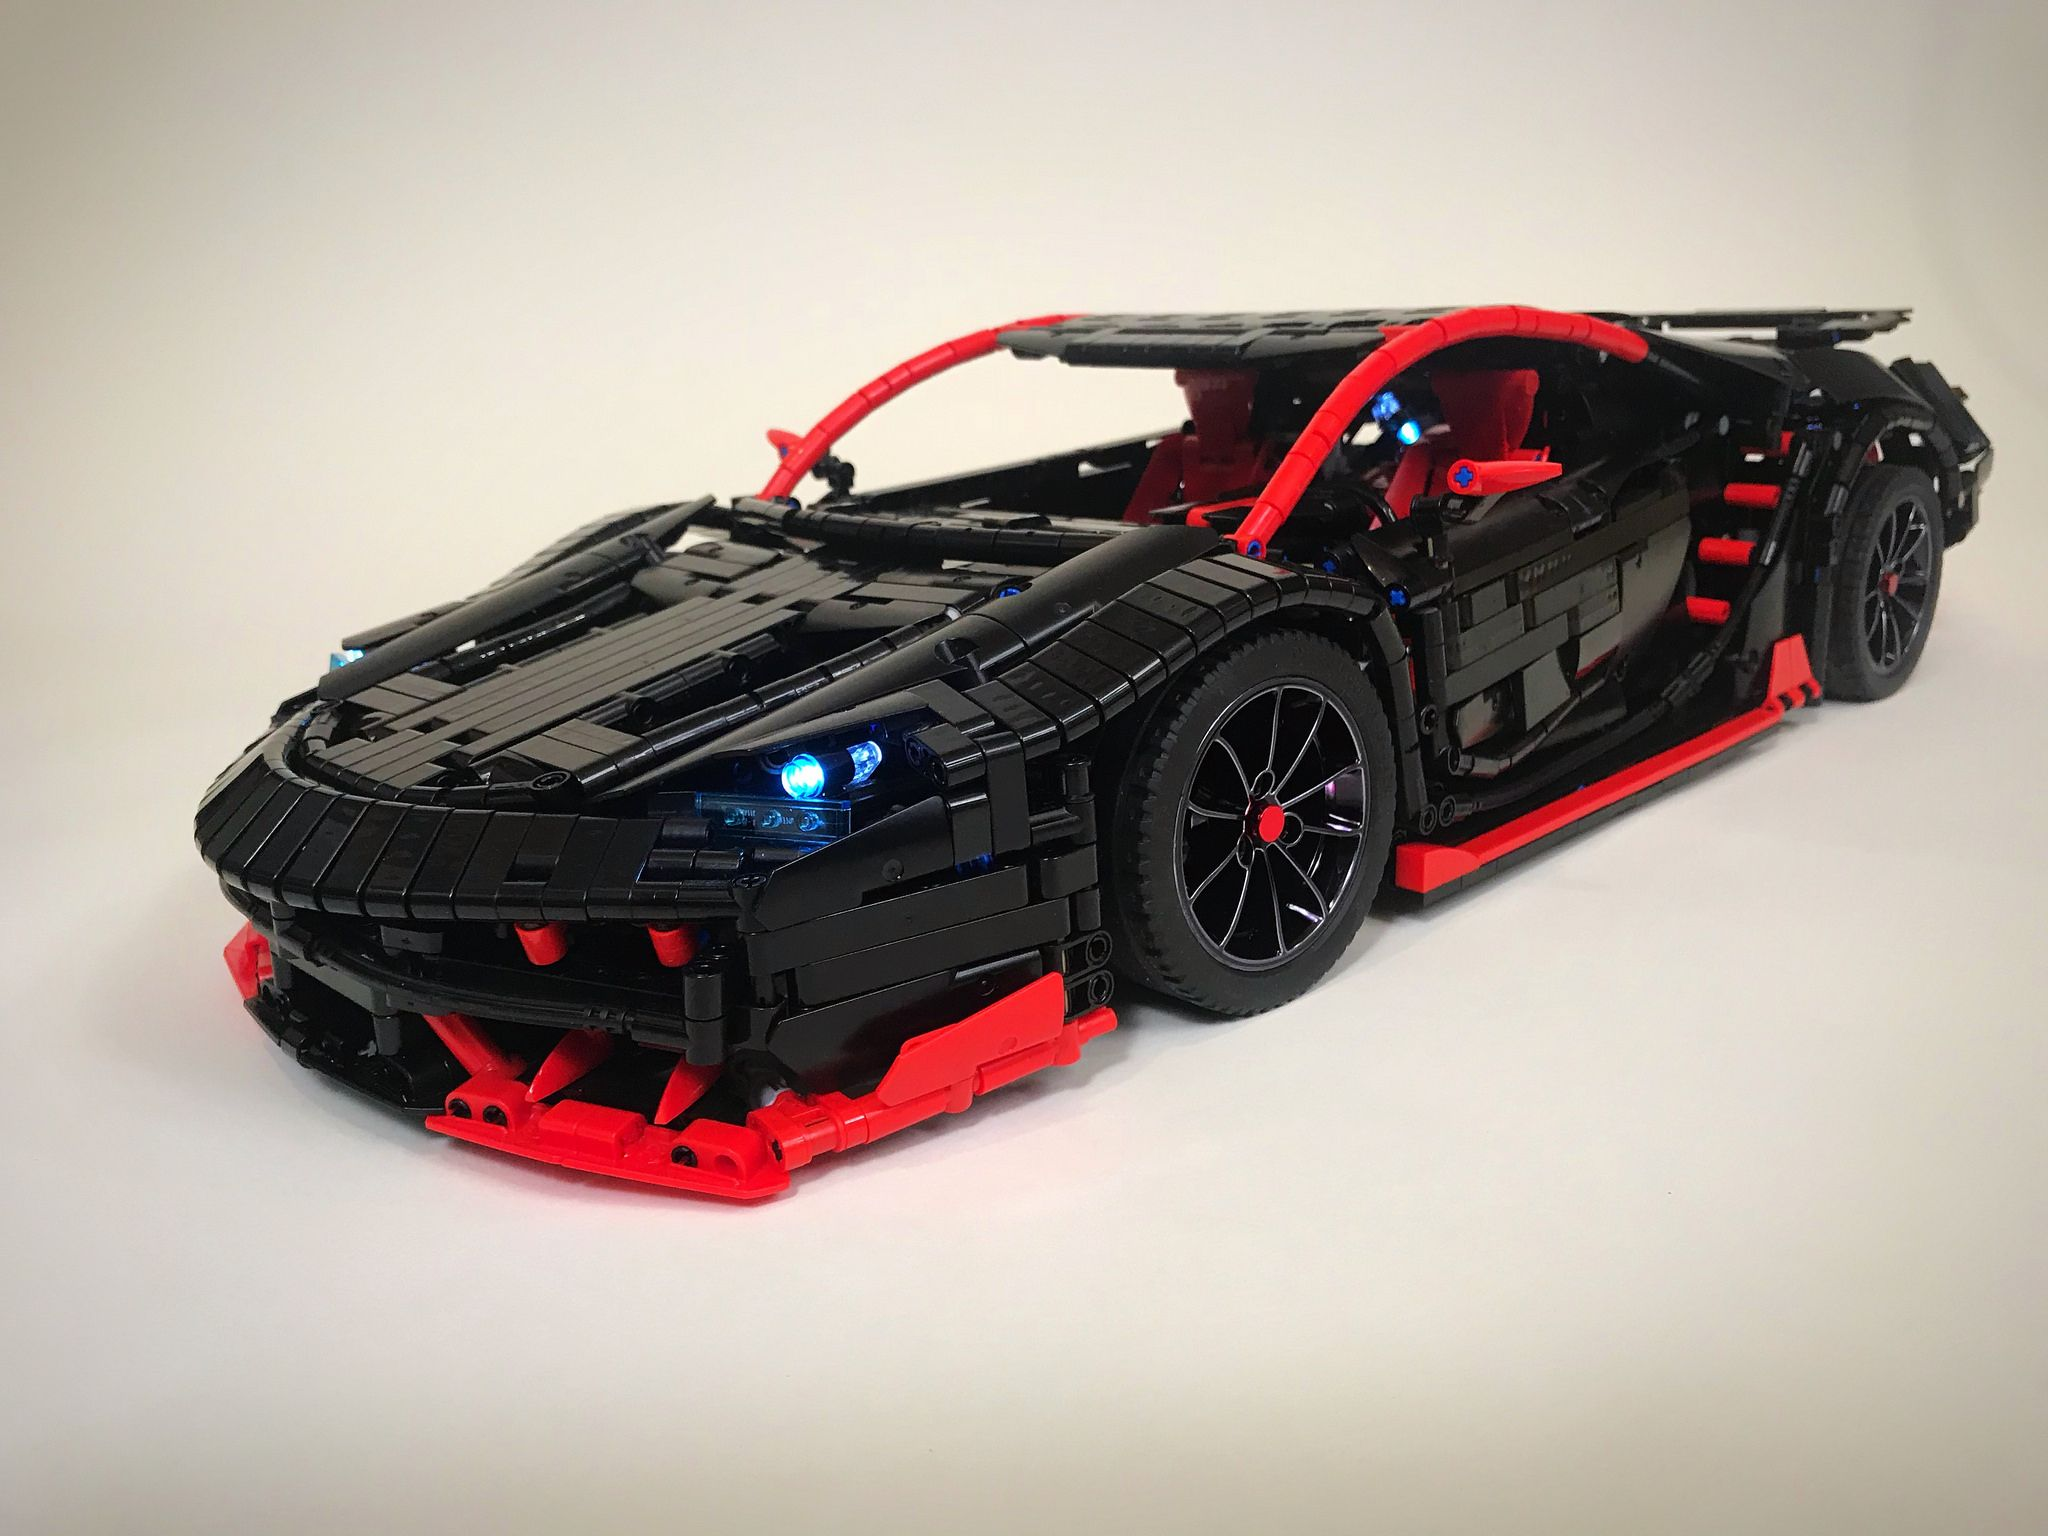 Exclusive 1 Lamborghini Centenario Lego Wheels Lego Technic Sets Lego Technic